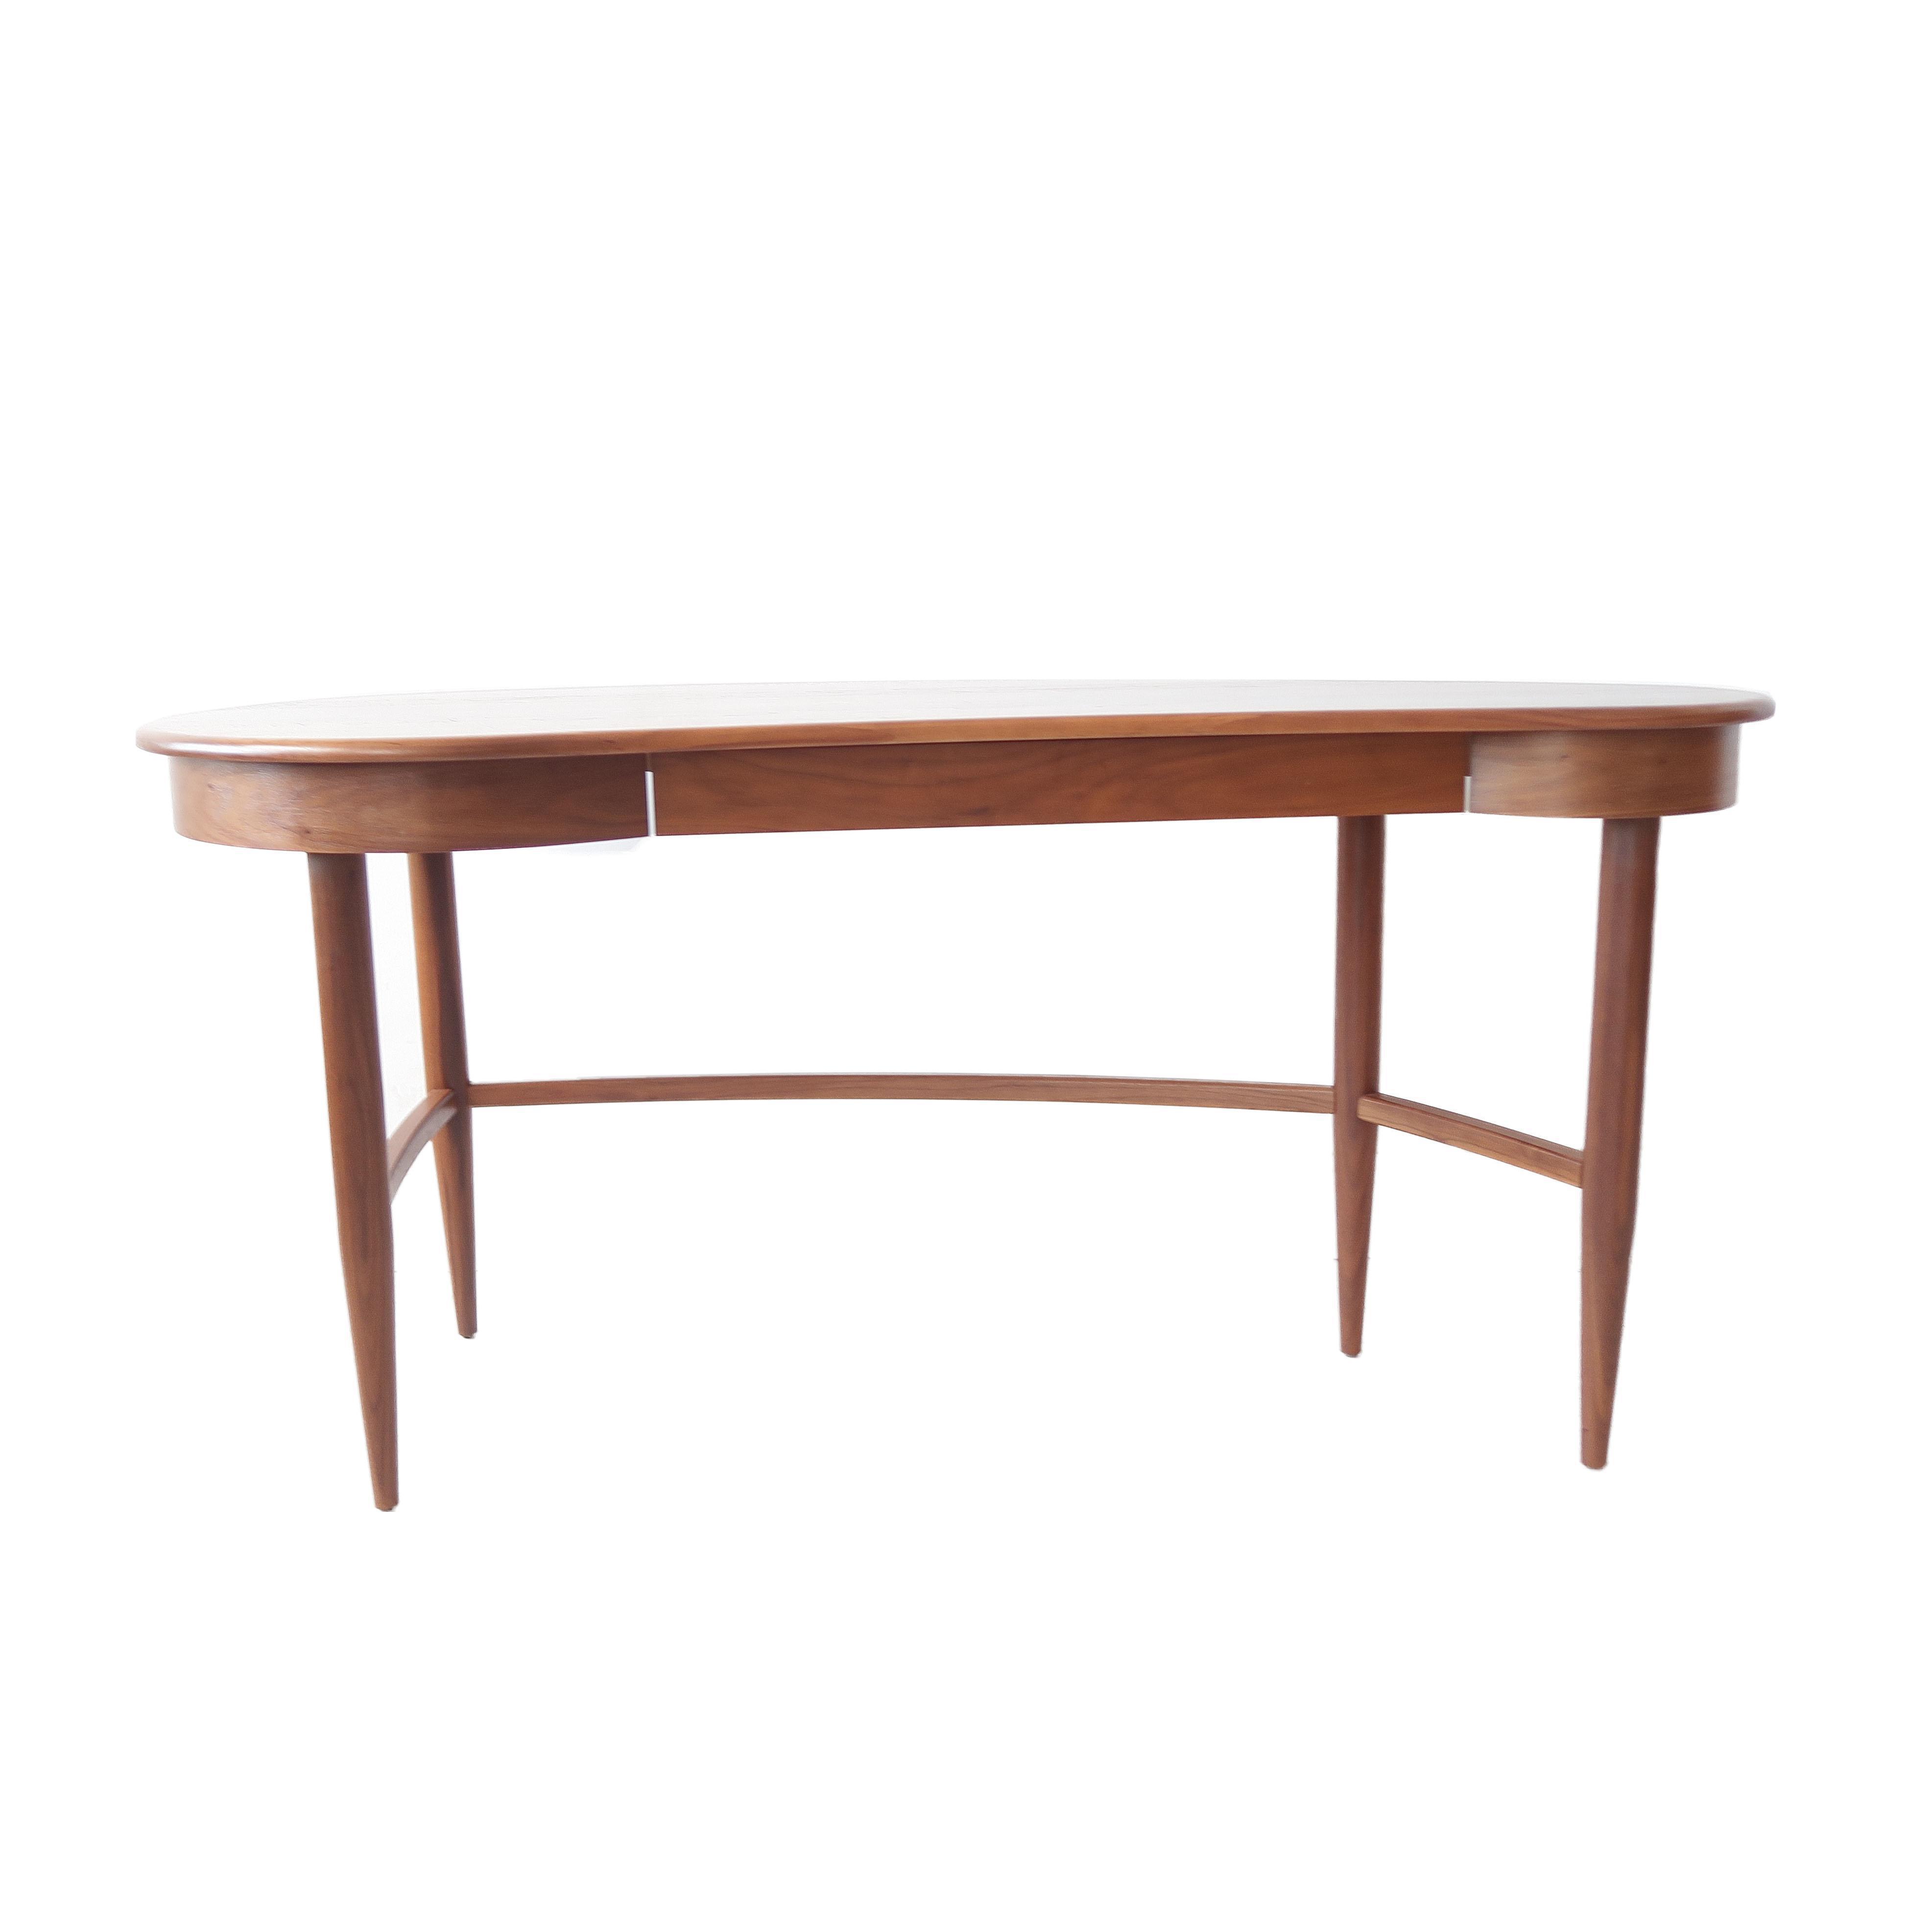 room and board kidney shaped desk home mid century desk room desk rh pinterest com boardroom desk mug board room deski